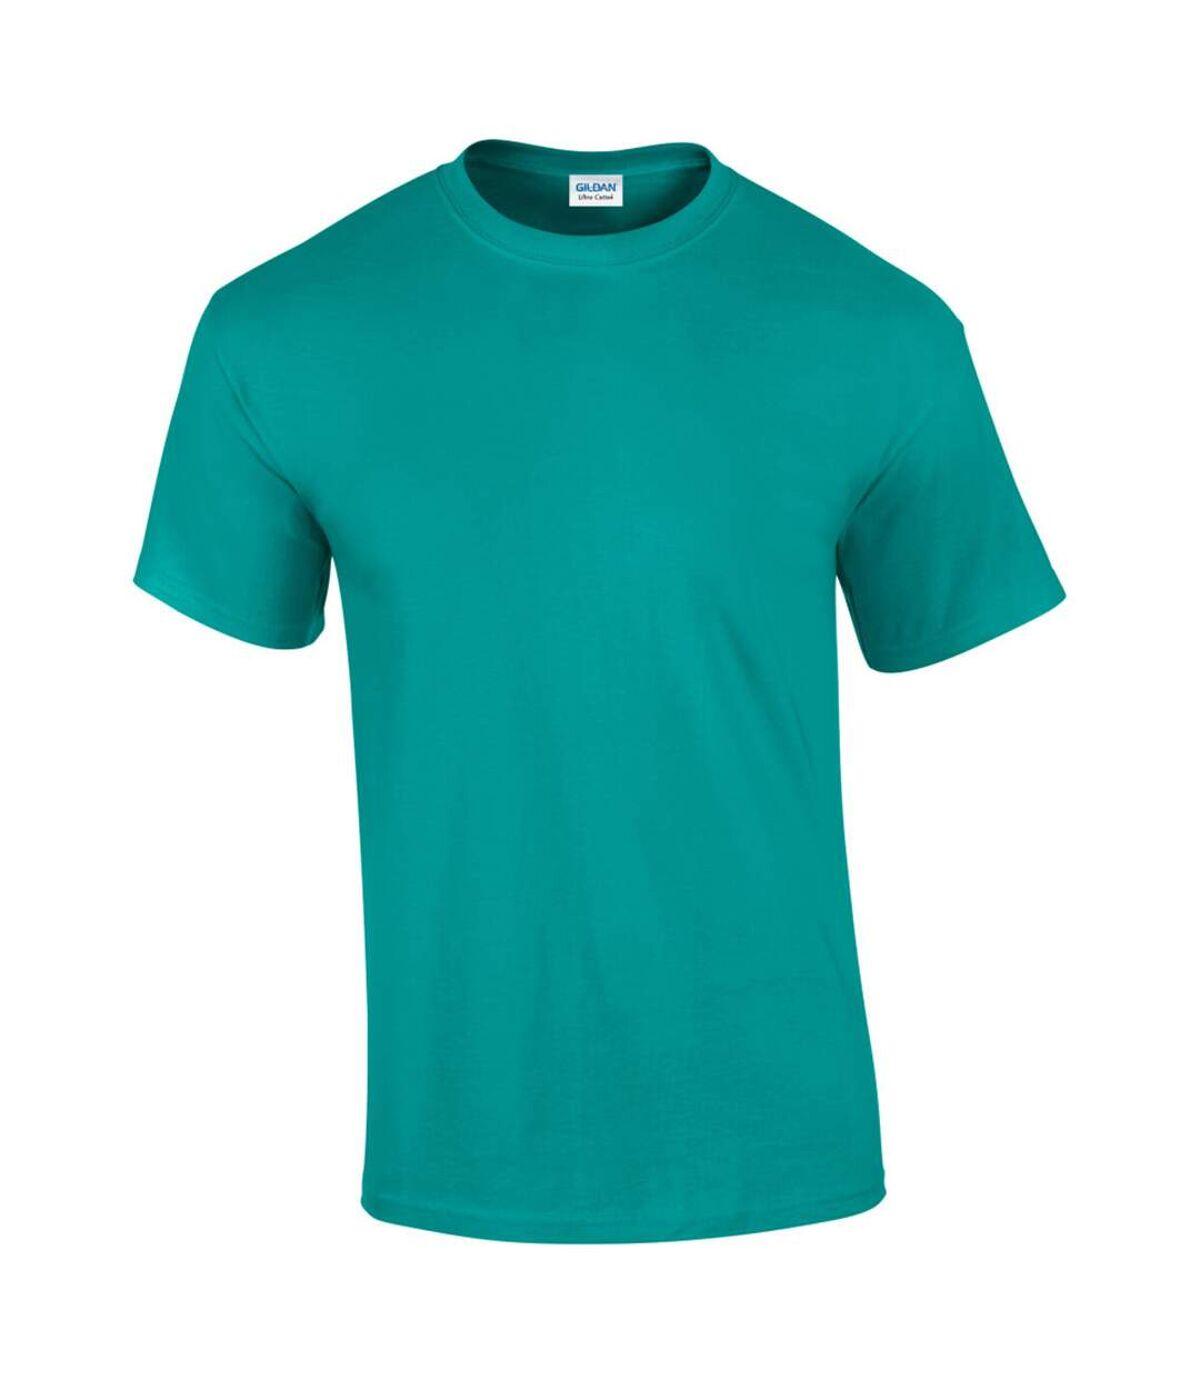 Gildan Mens Ultra Cotton Short Sleeve T-Shirt (Natural) - UTBC475